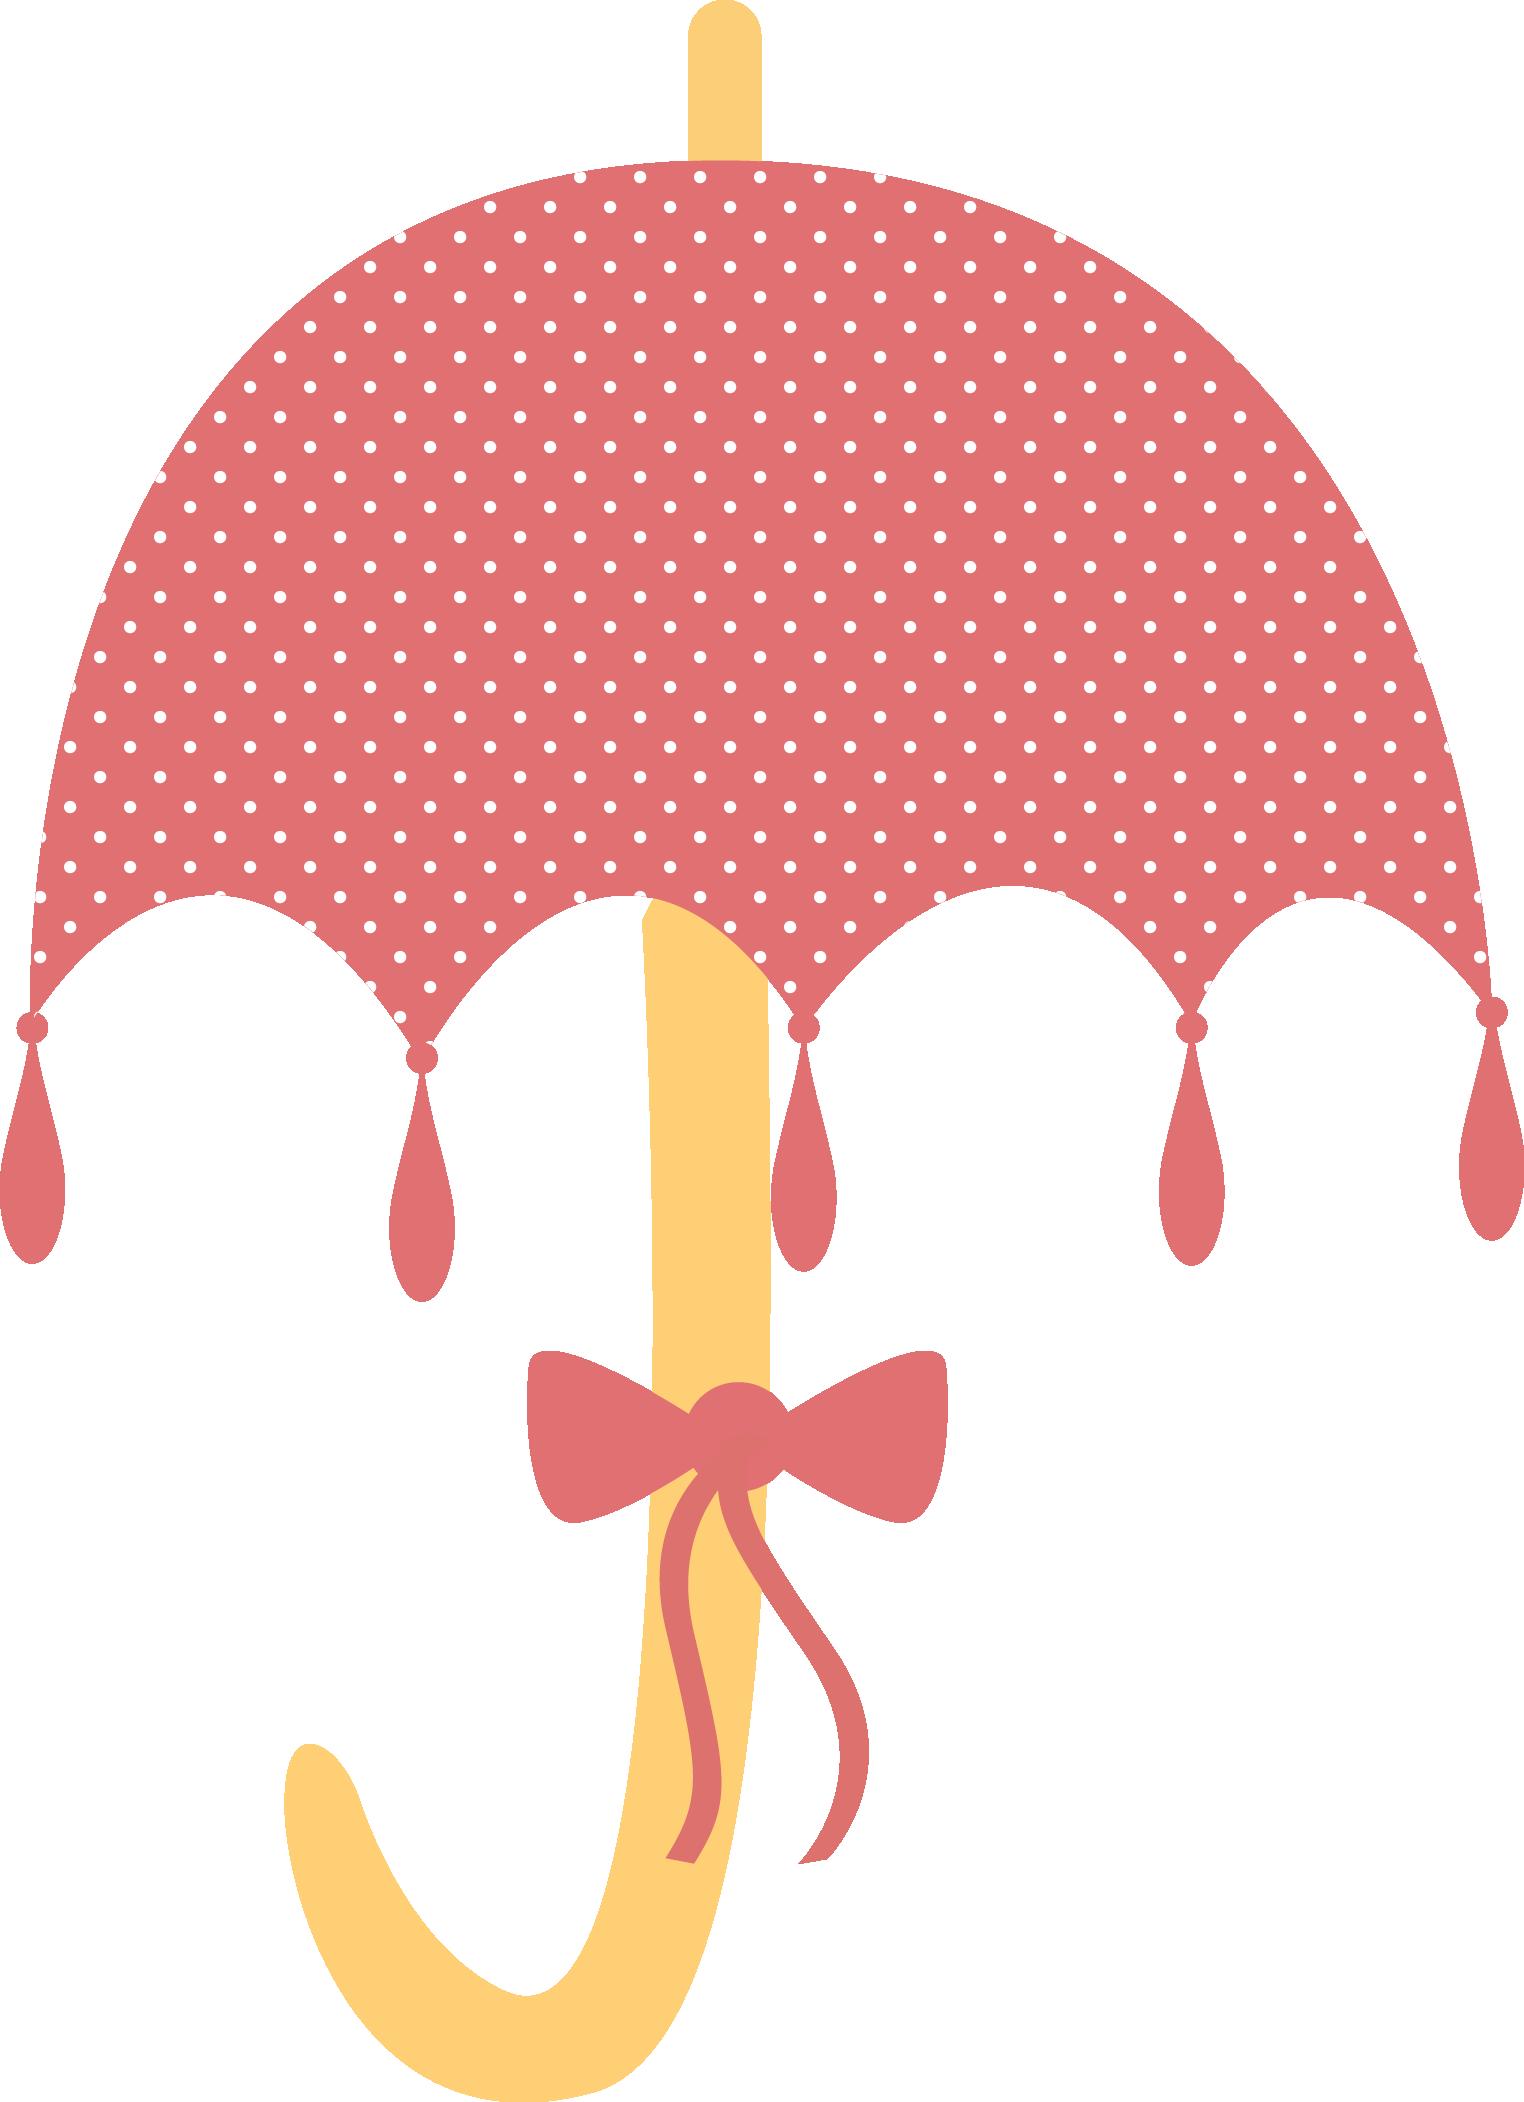 Costura e roupas rifabulousfashion. Clipart umbrella rainy clothes